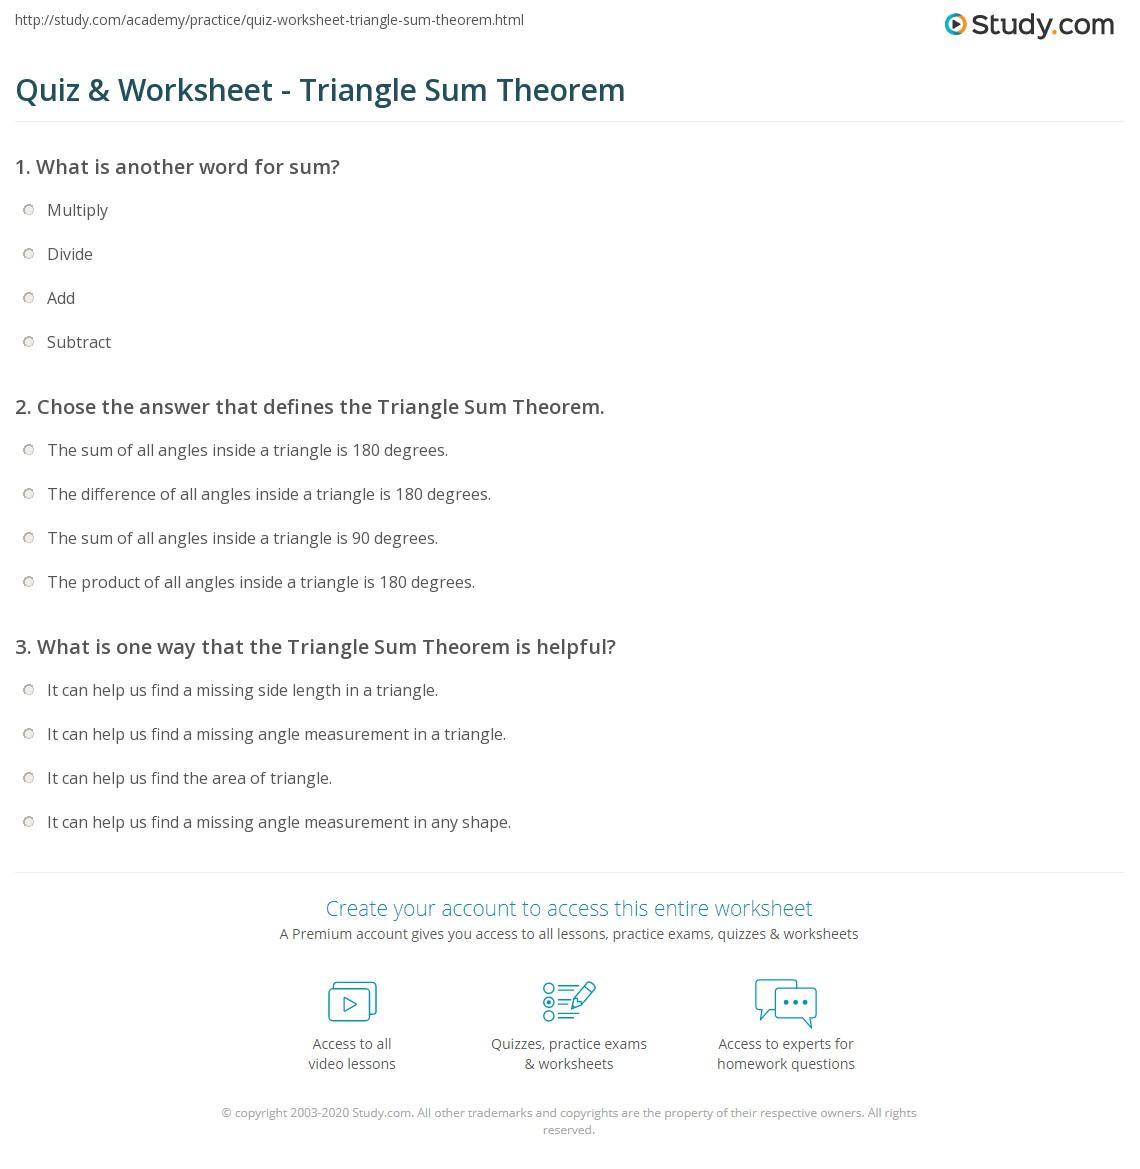 worksheet Triangle Angle Sum Theorem Worksheet quiz worksheet triangle sum theorem study com print definition examples worksheet